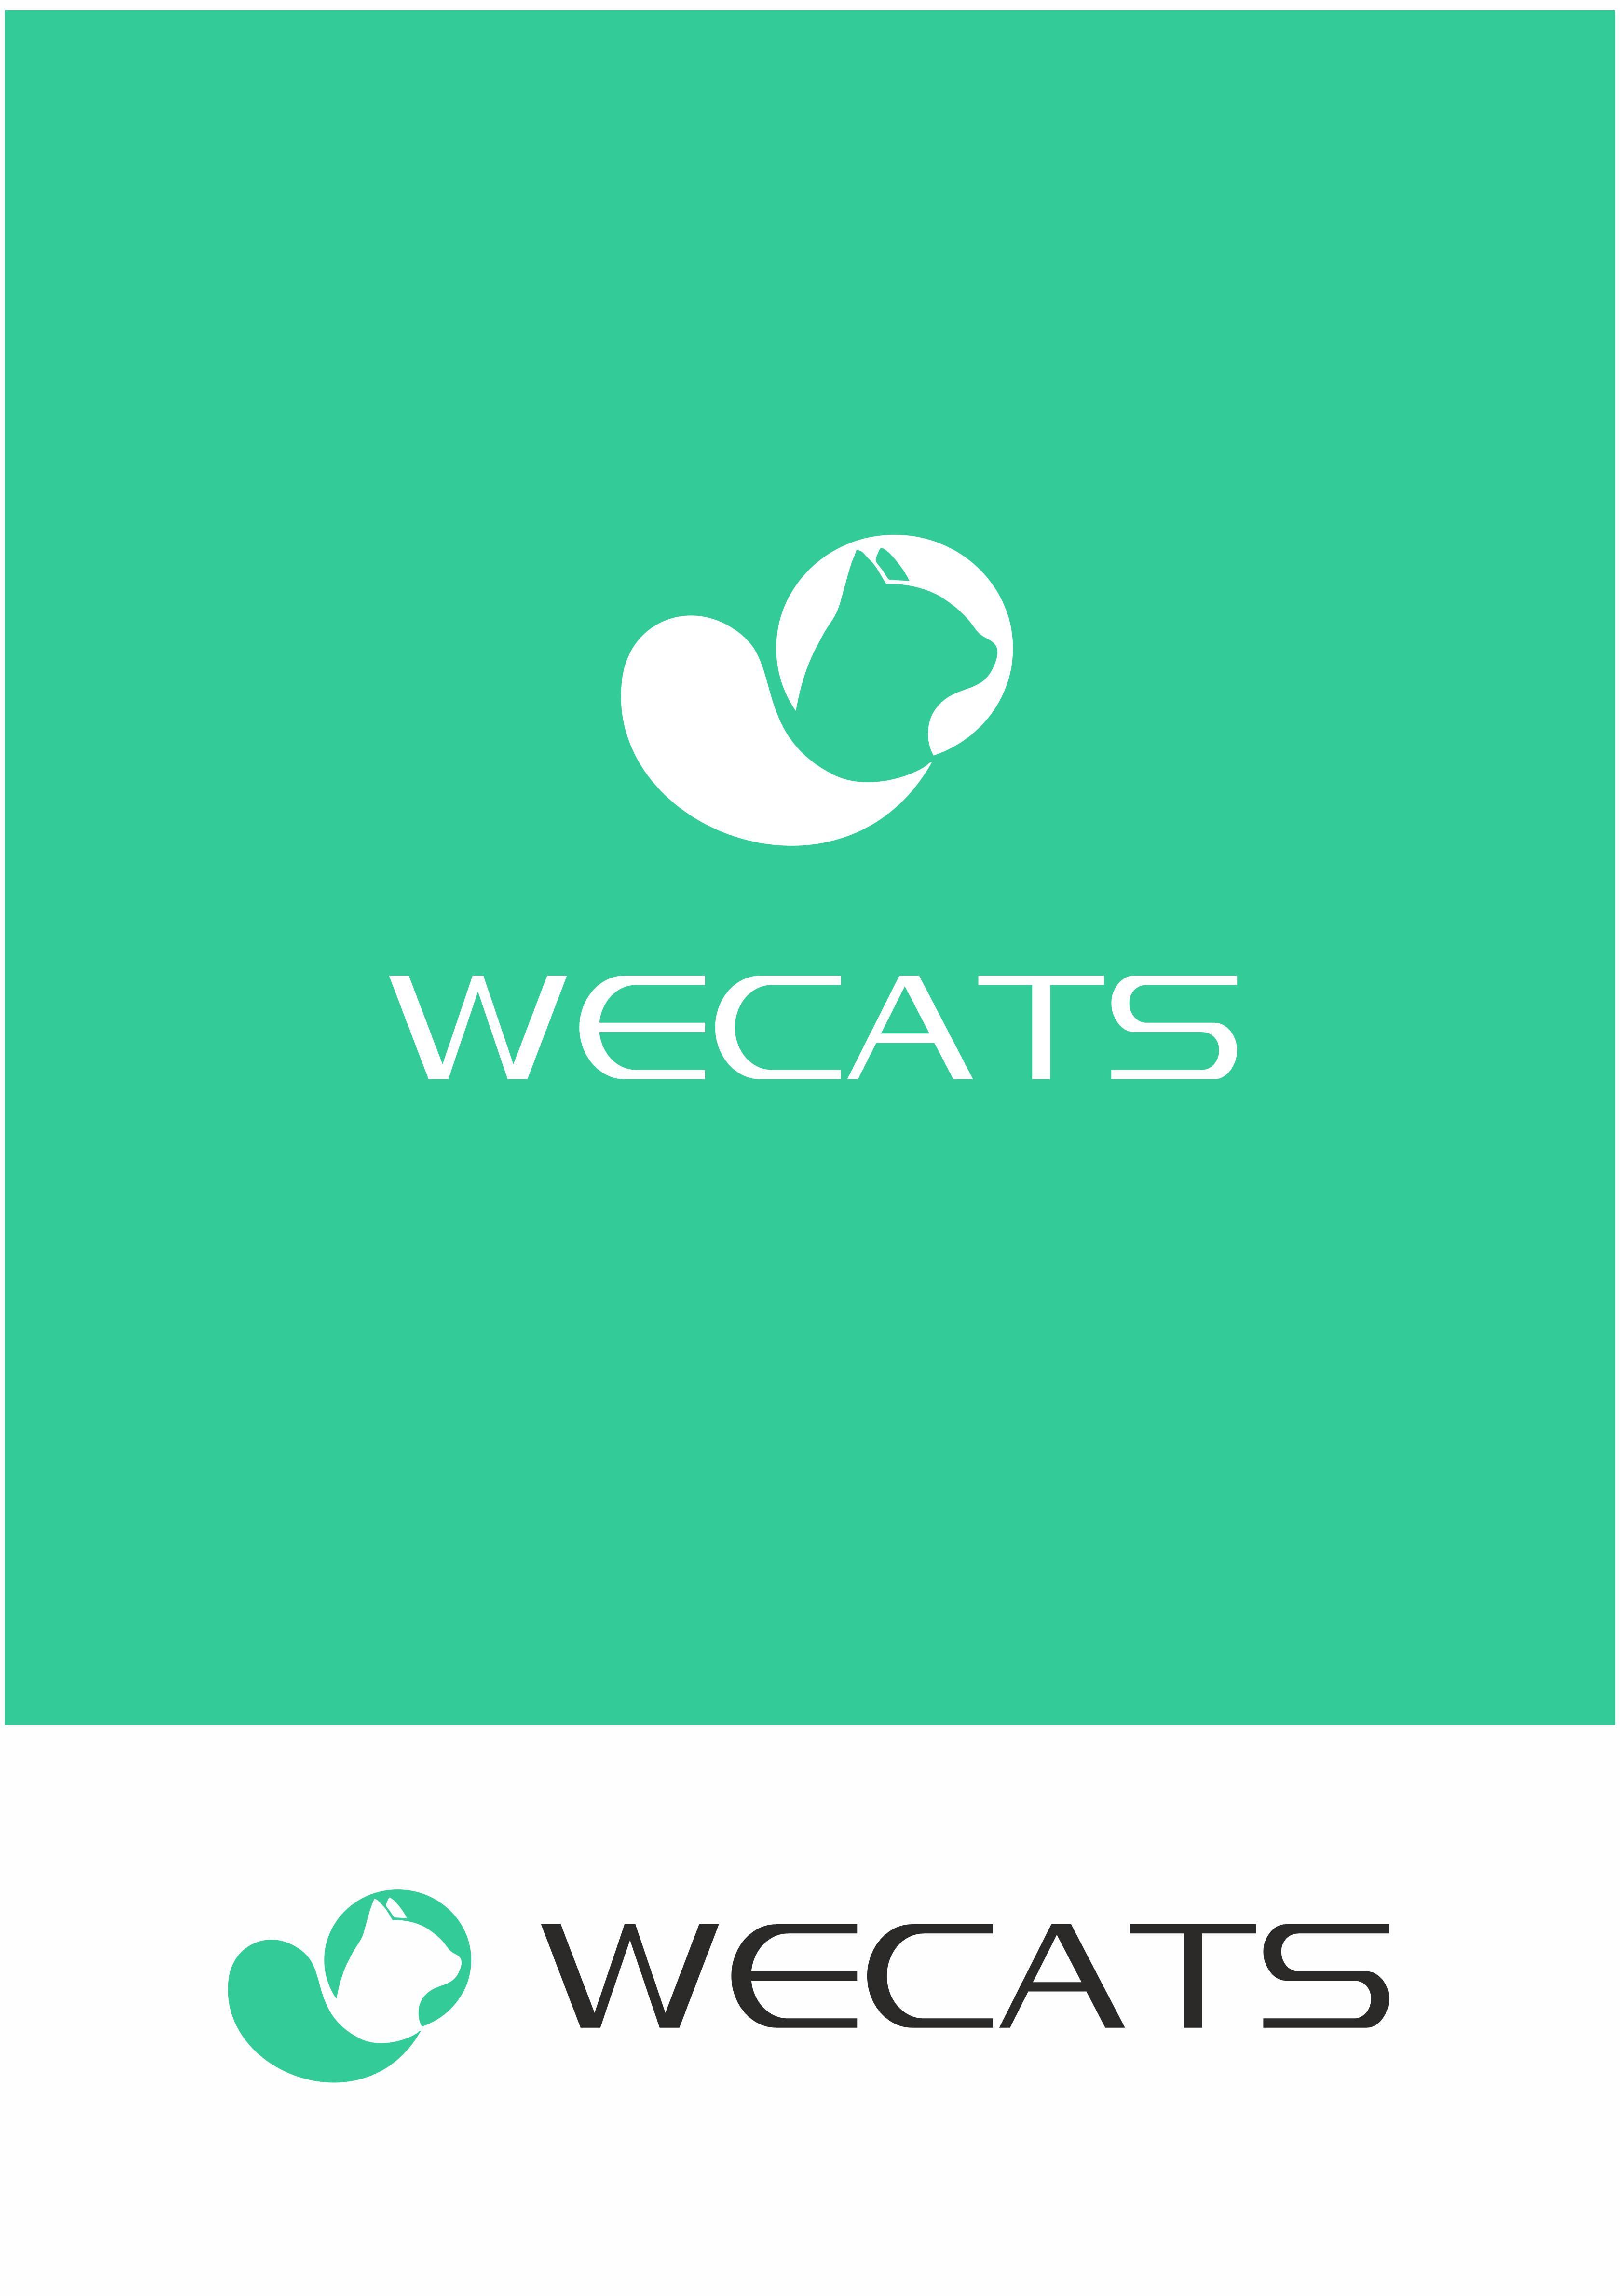 Создание логотипа WeCats фото f_9485f19233572107.jpg